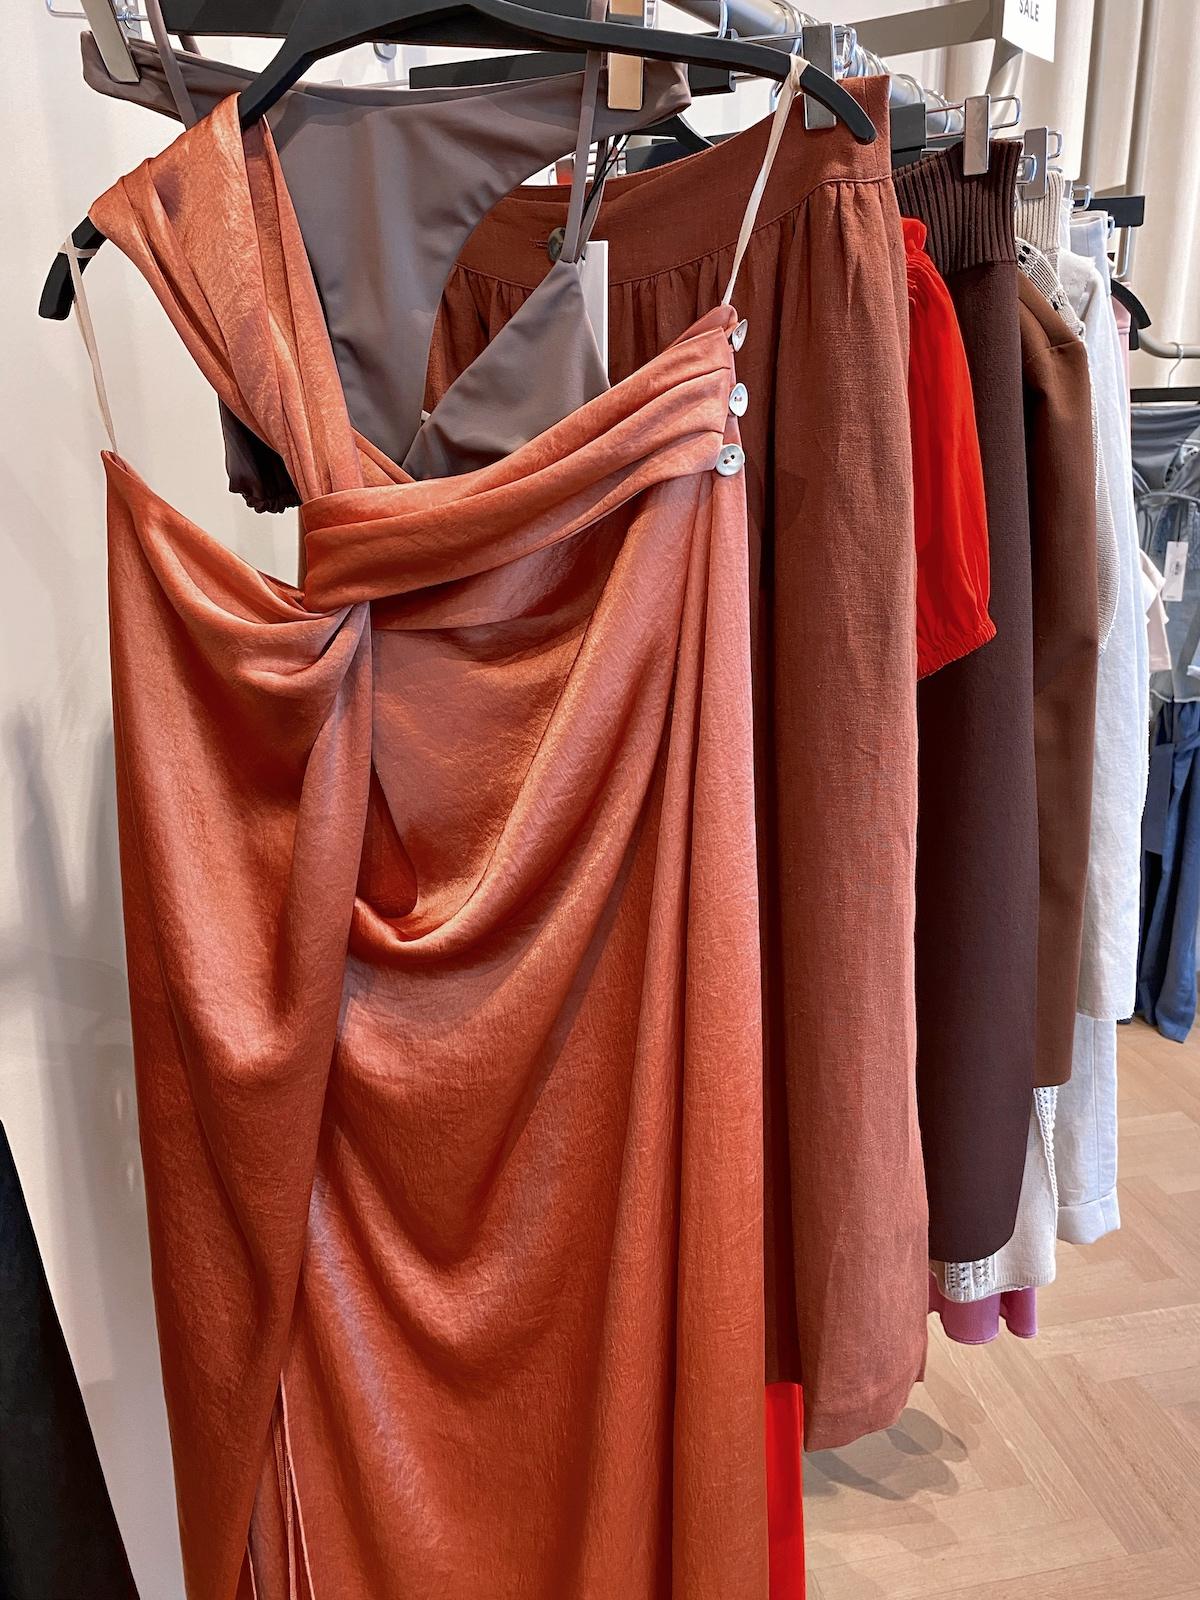 Vivian Graf Zurich shopping